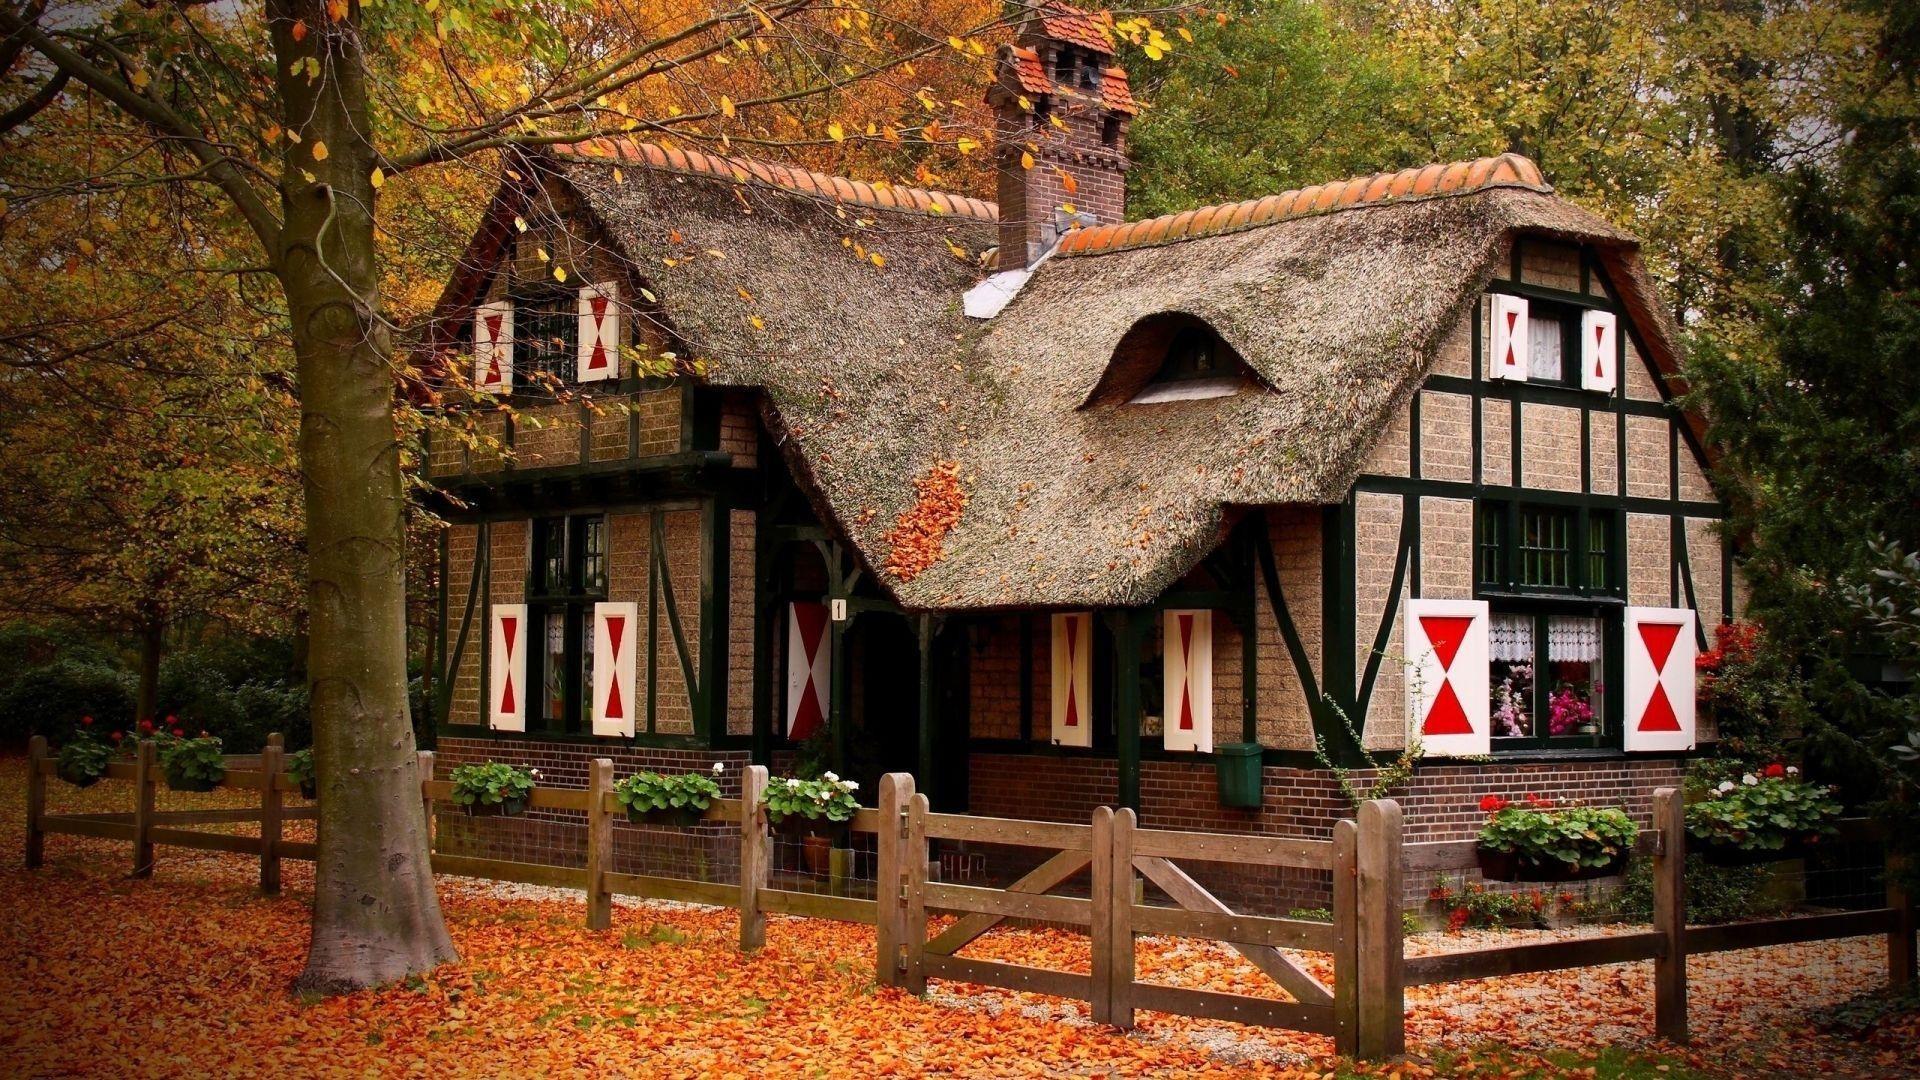 Cozy House Outside Wallpaper